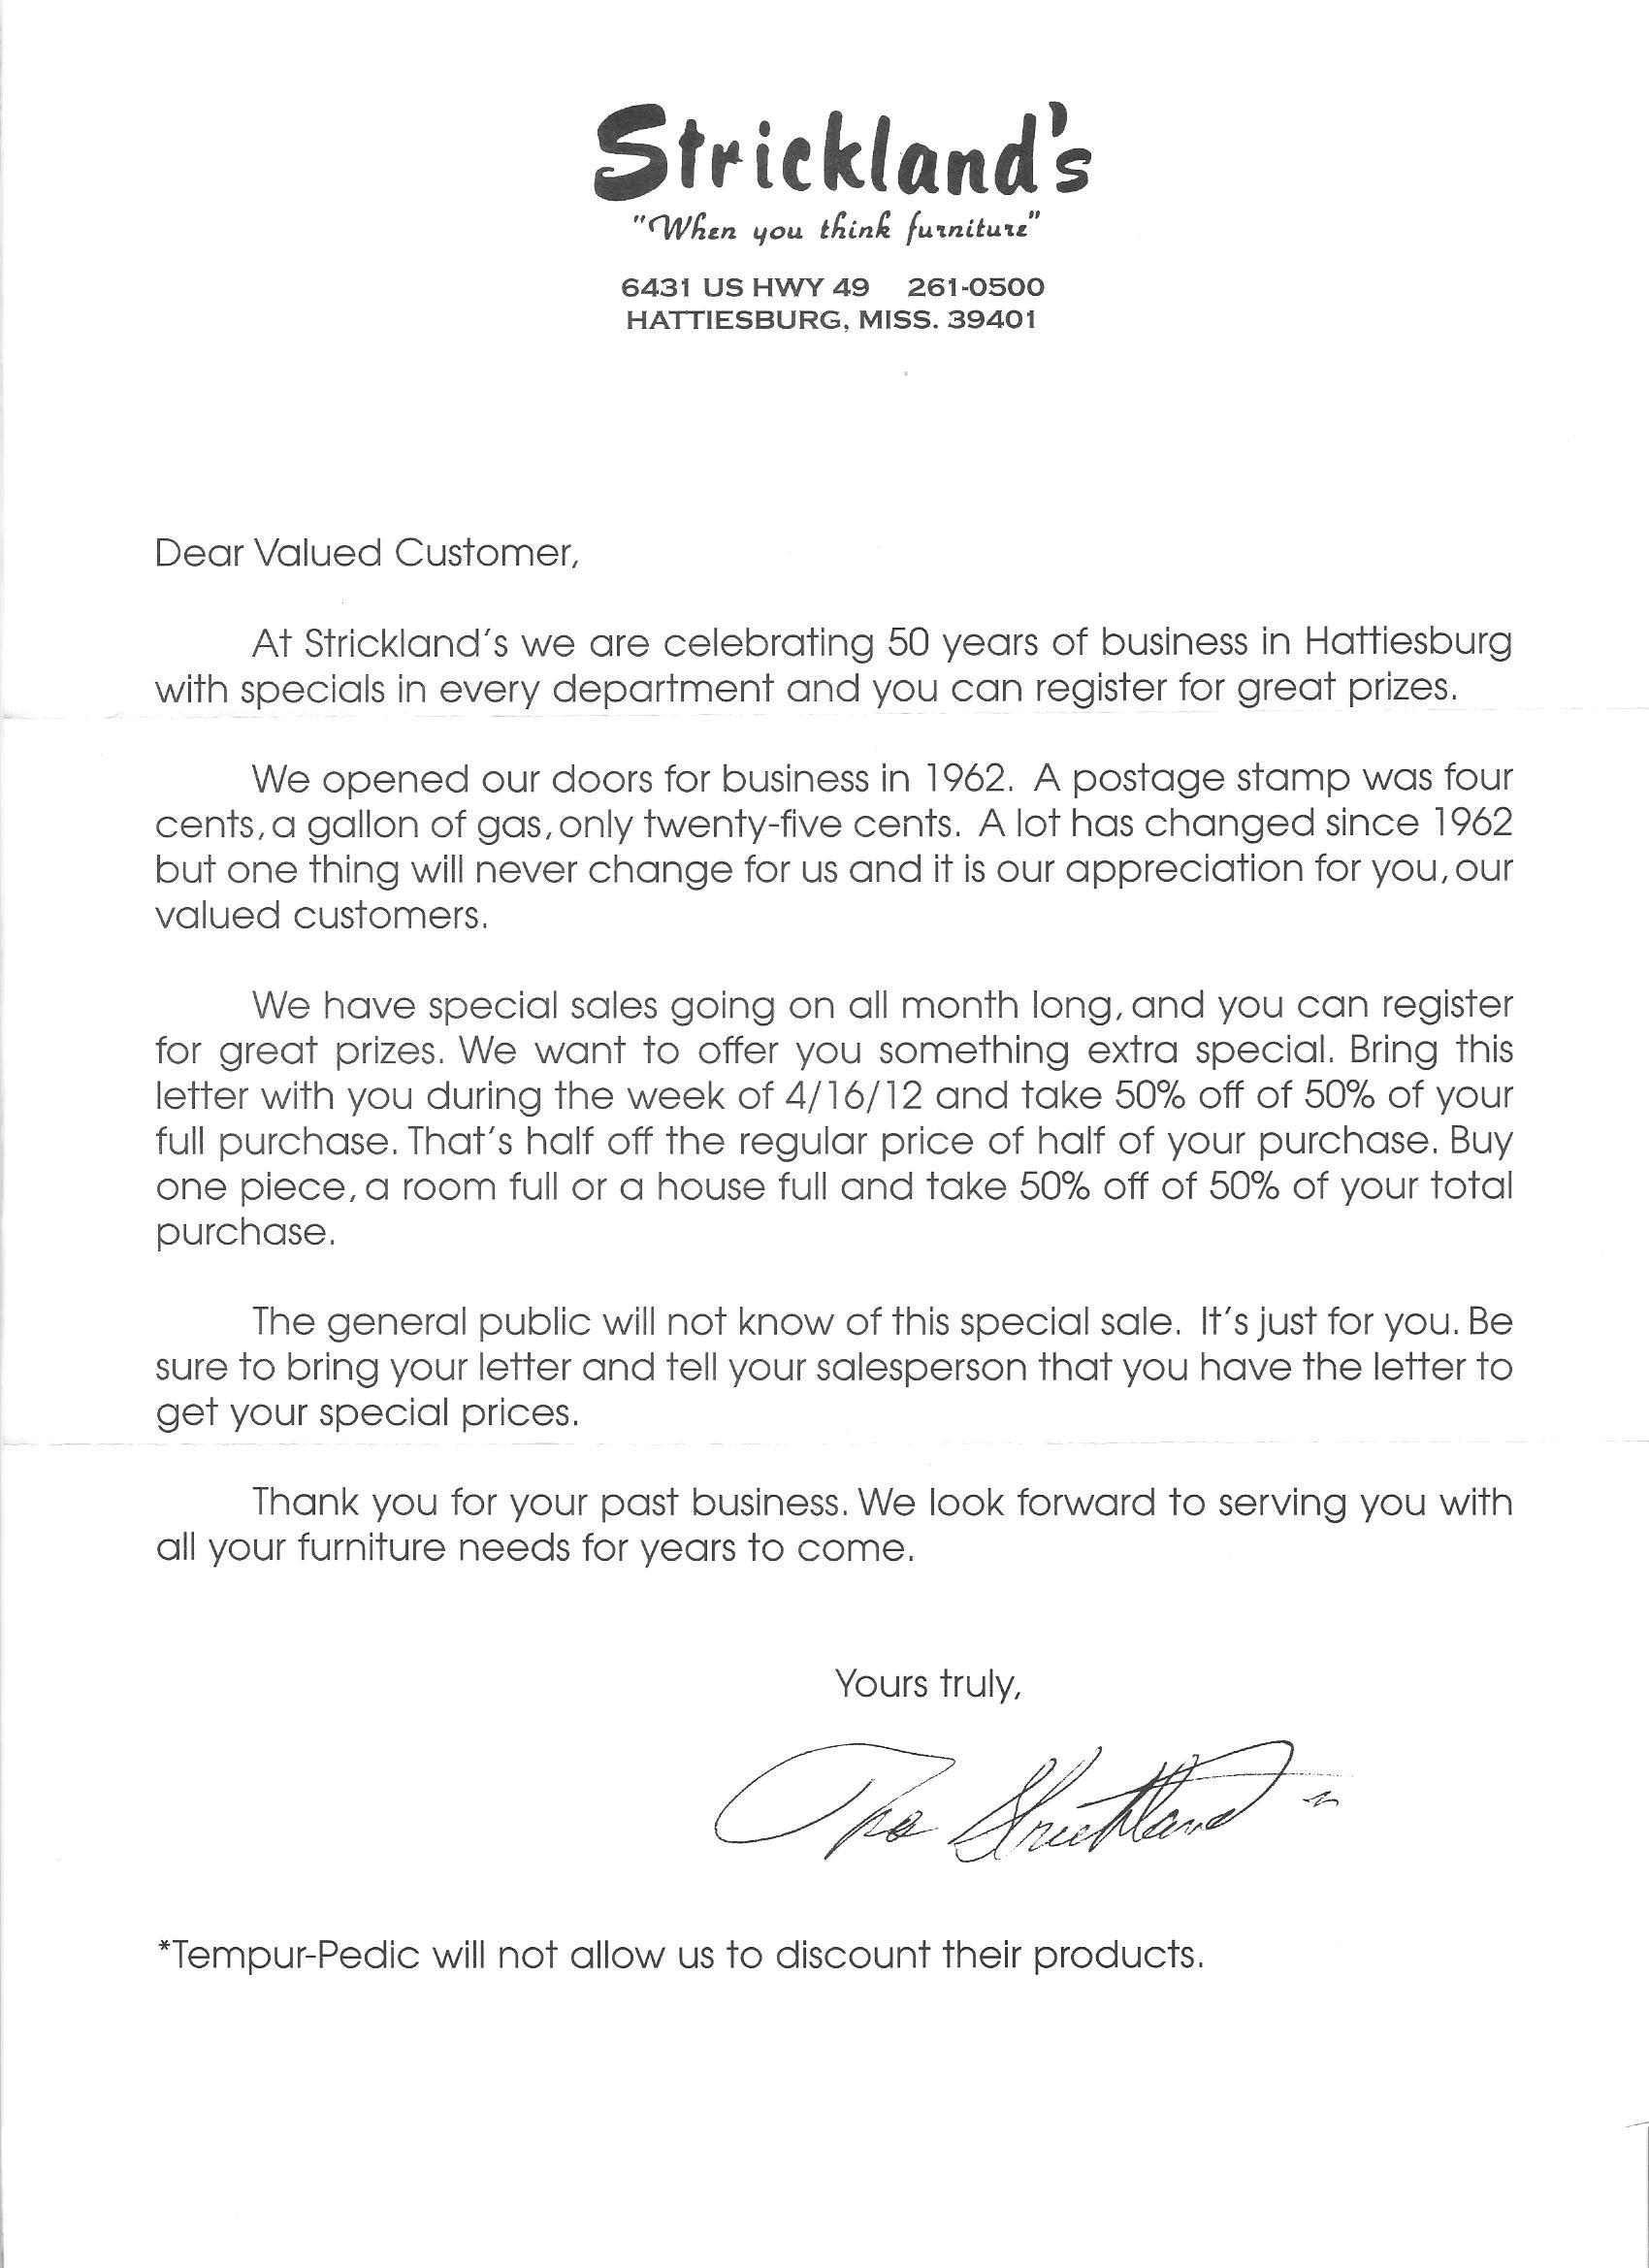 StrickLand's Letter